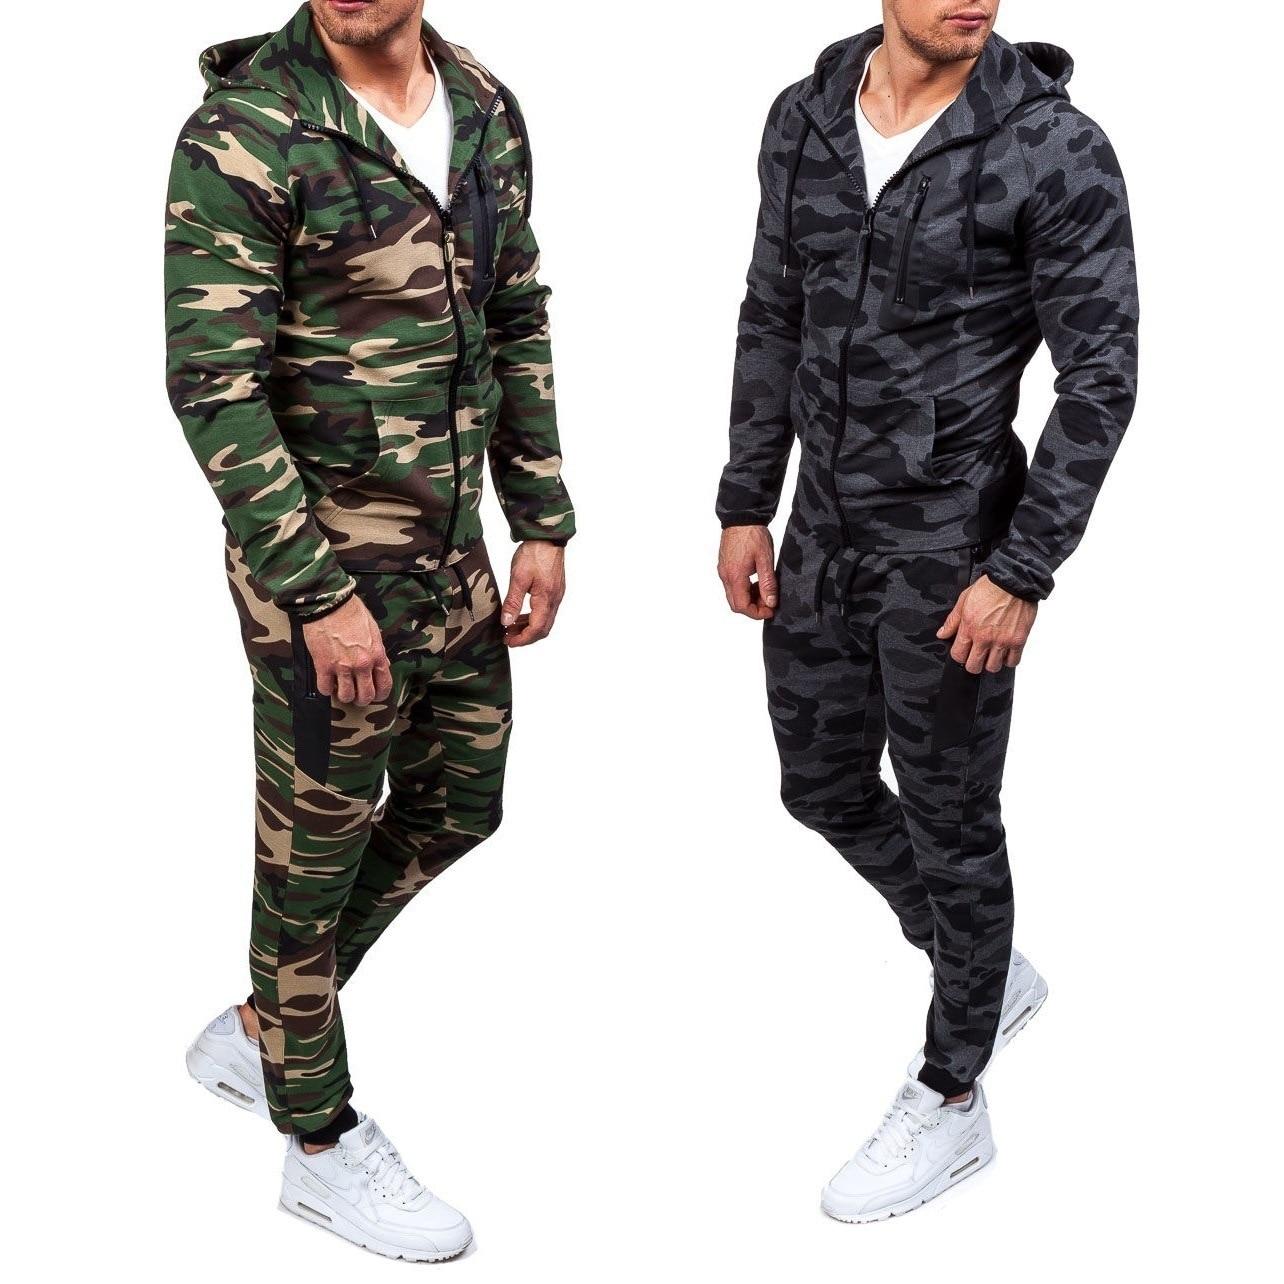 ZOGAA 2019 New Camouflage Printed Men Set Causal Jacket Men 2Pcs Tracksuit Sportswear Hoodies Sweatshirt Pants Jogger Suit